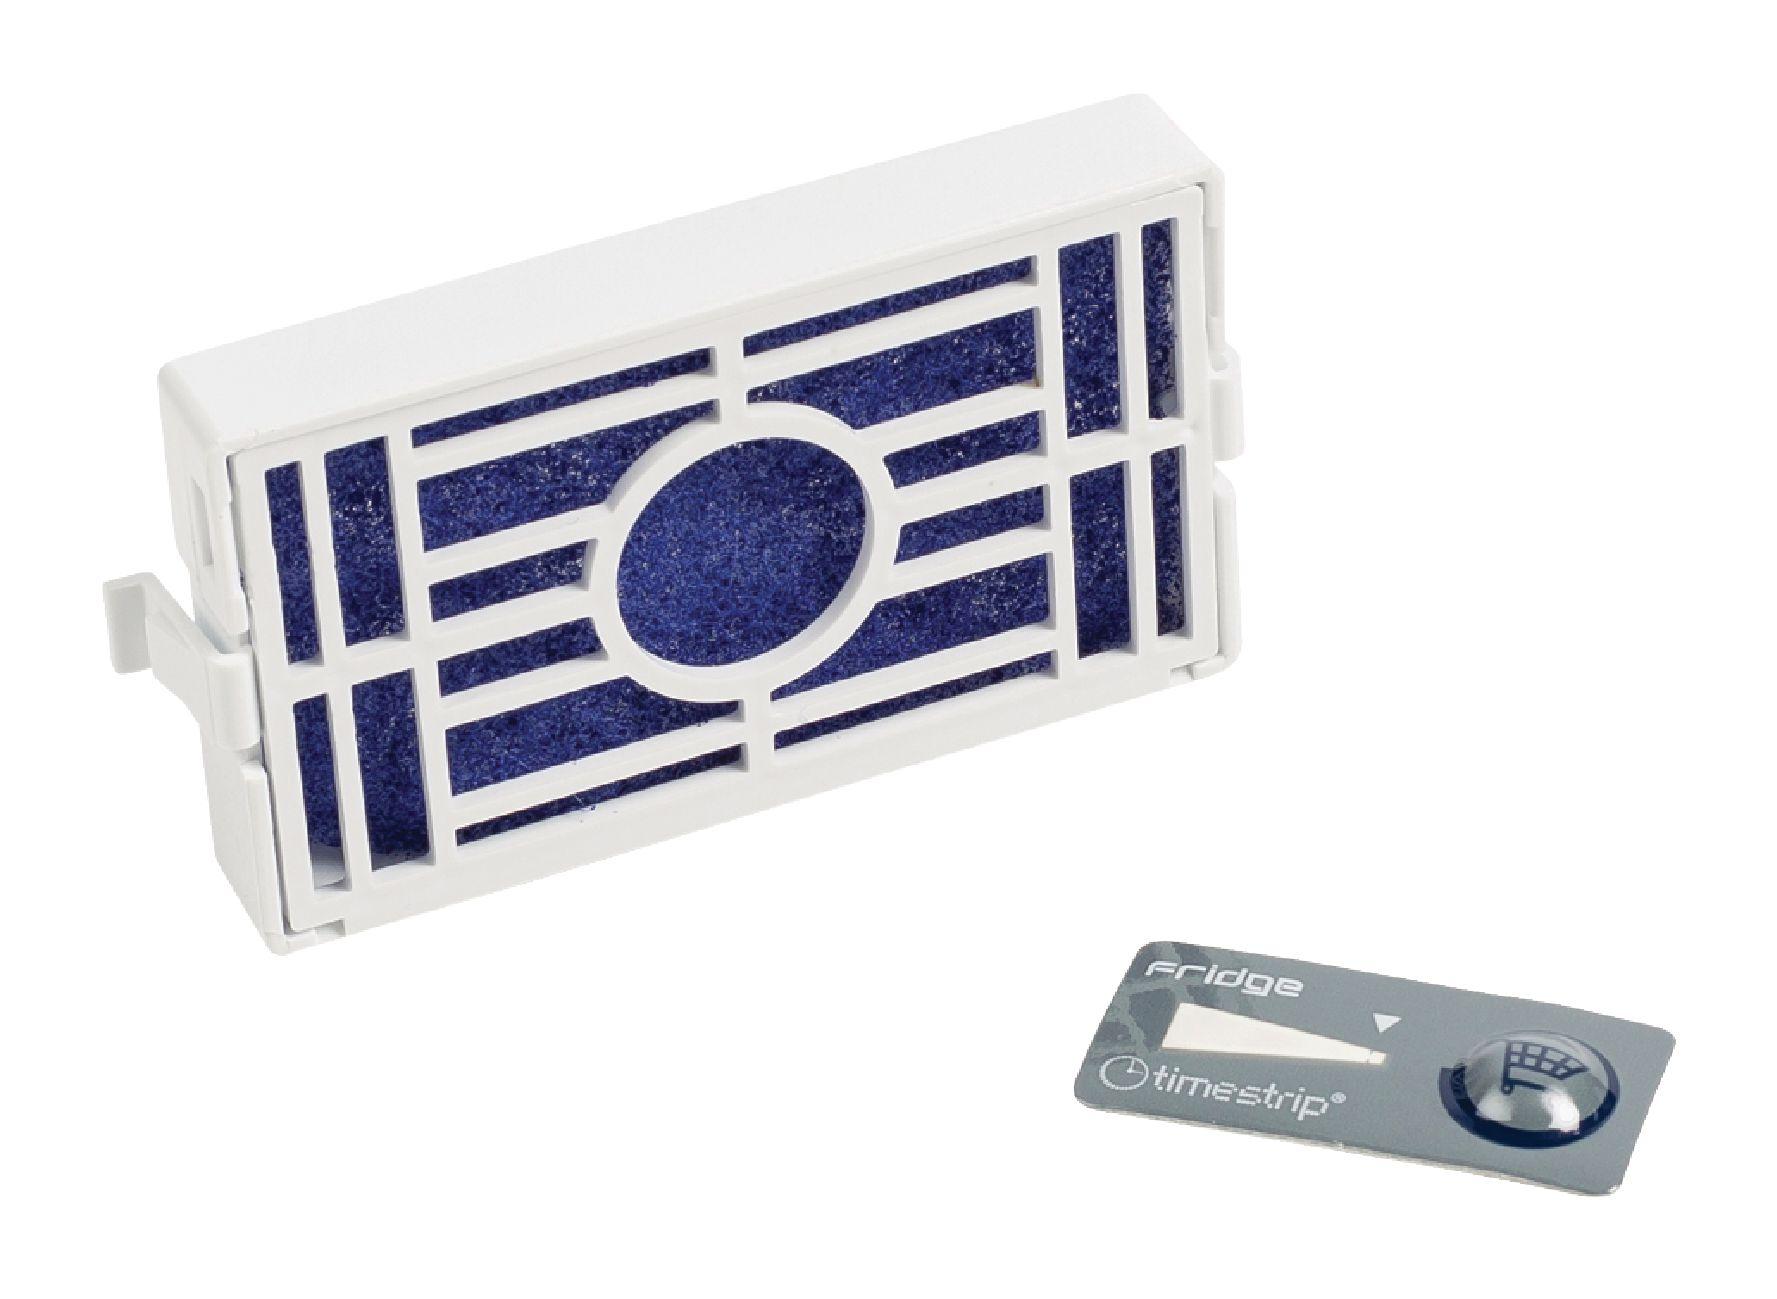 WPRO Filtro anti-bacterias para frigor?fico